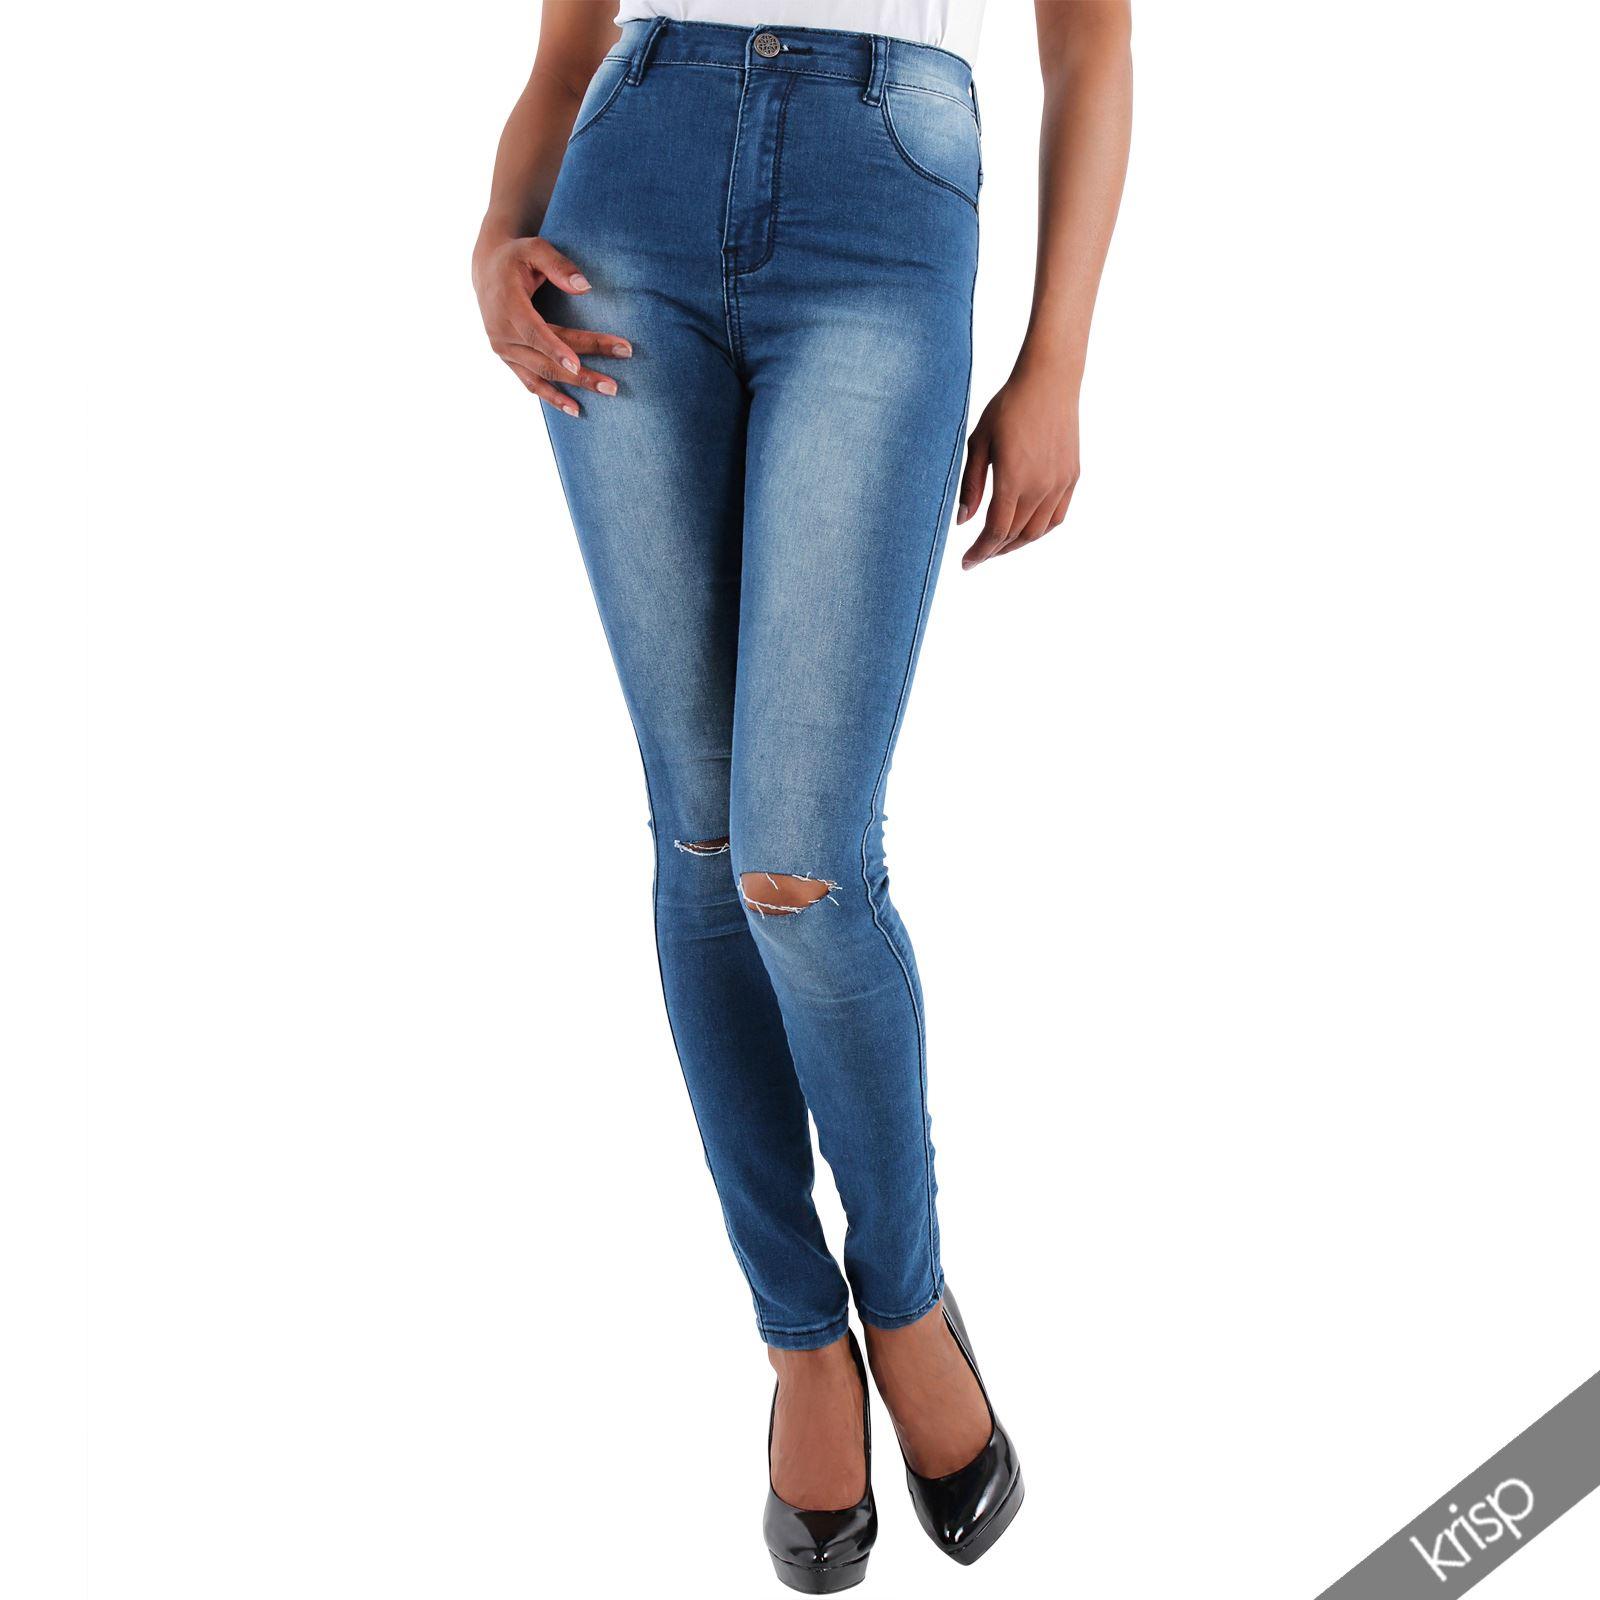 damen high waisted jeans slim fit ripped aufgerissen hoher bund stretch jeggings ebay. Black Bedroom Furniture Sets. Home Design Ideas